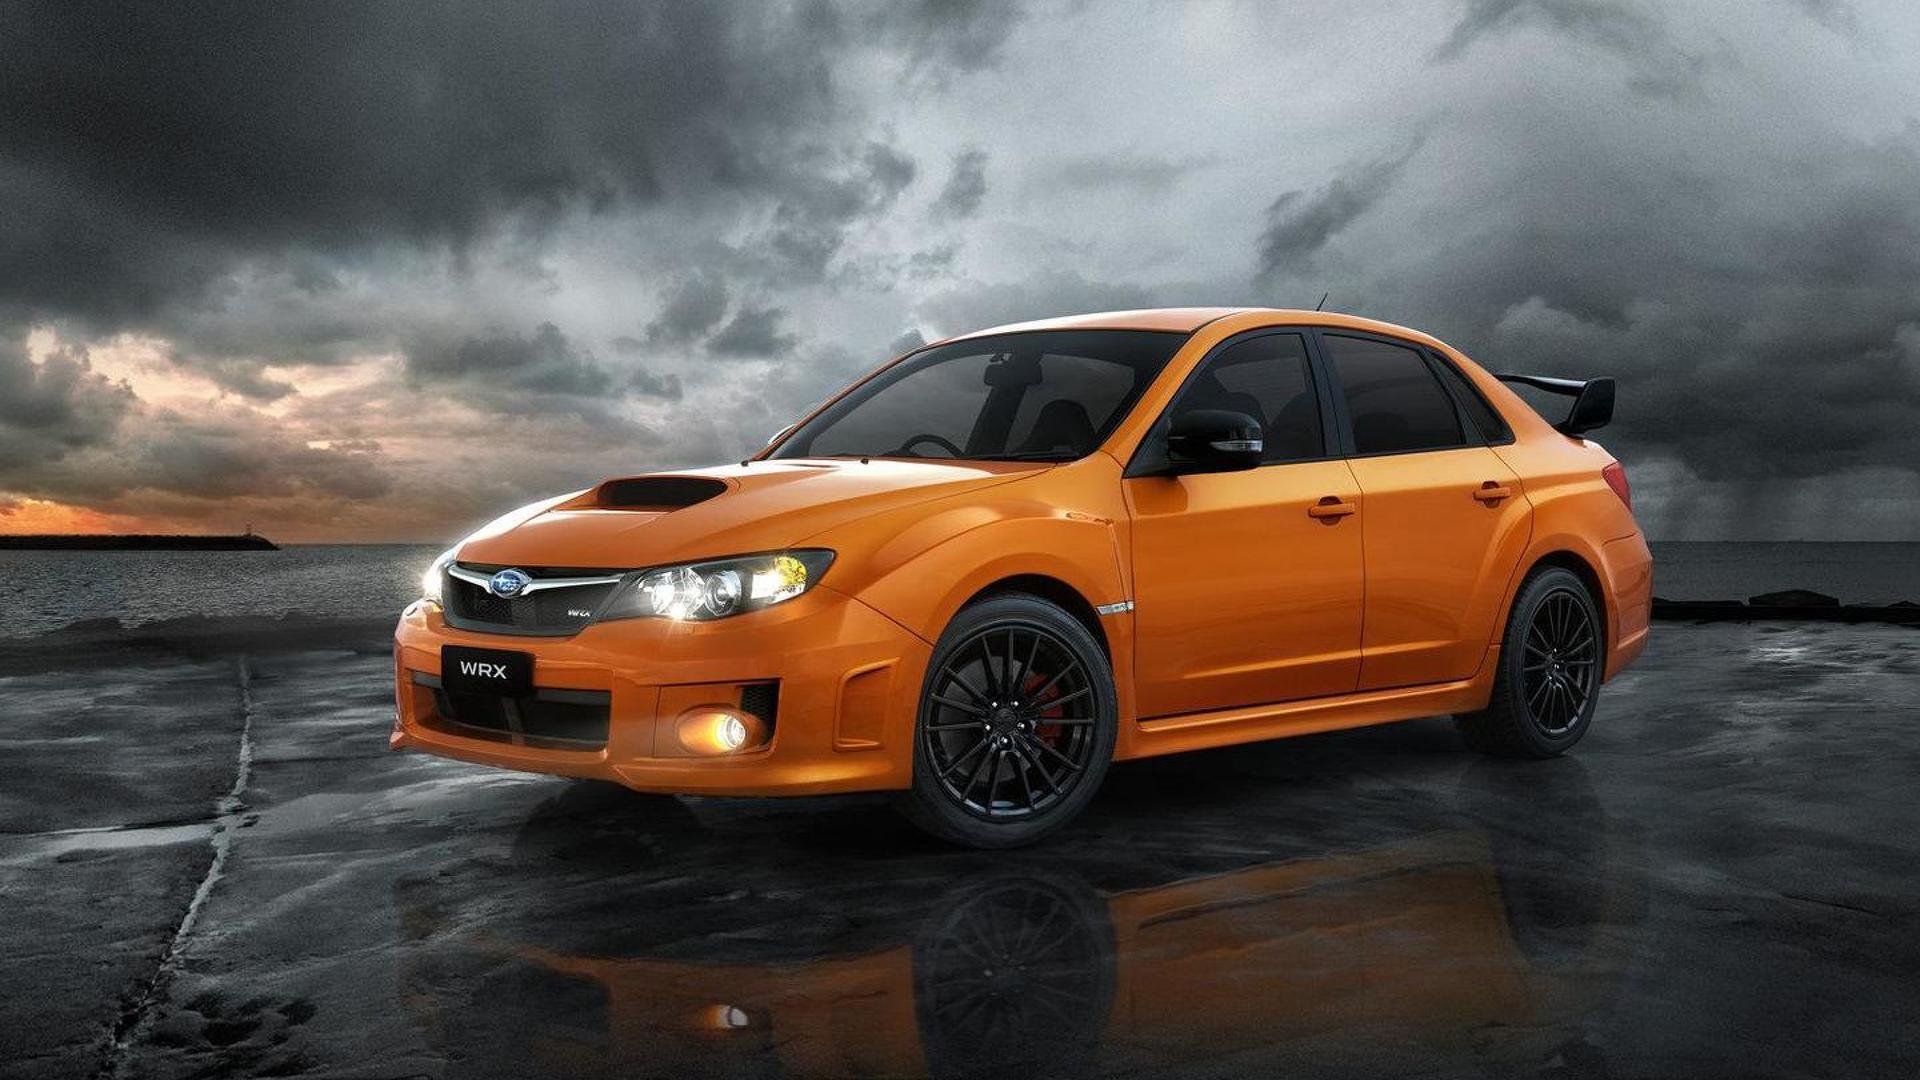 Subaru Impreza WRX Club Spec limited edition announced for Australia